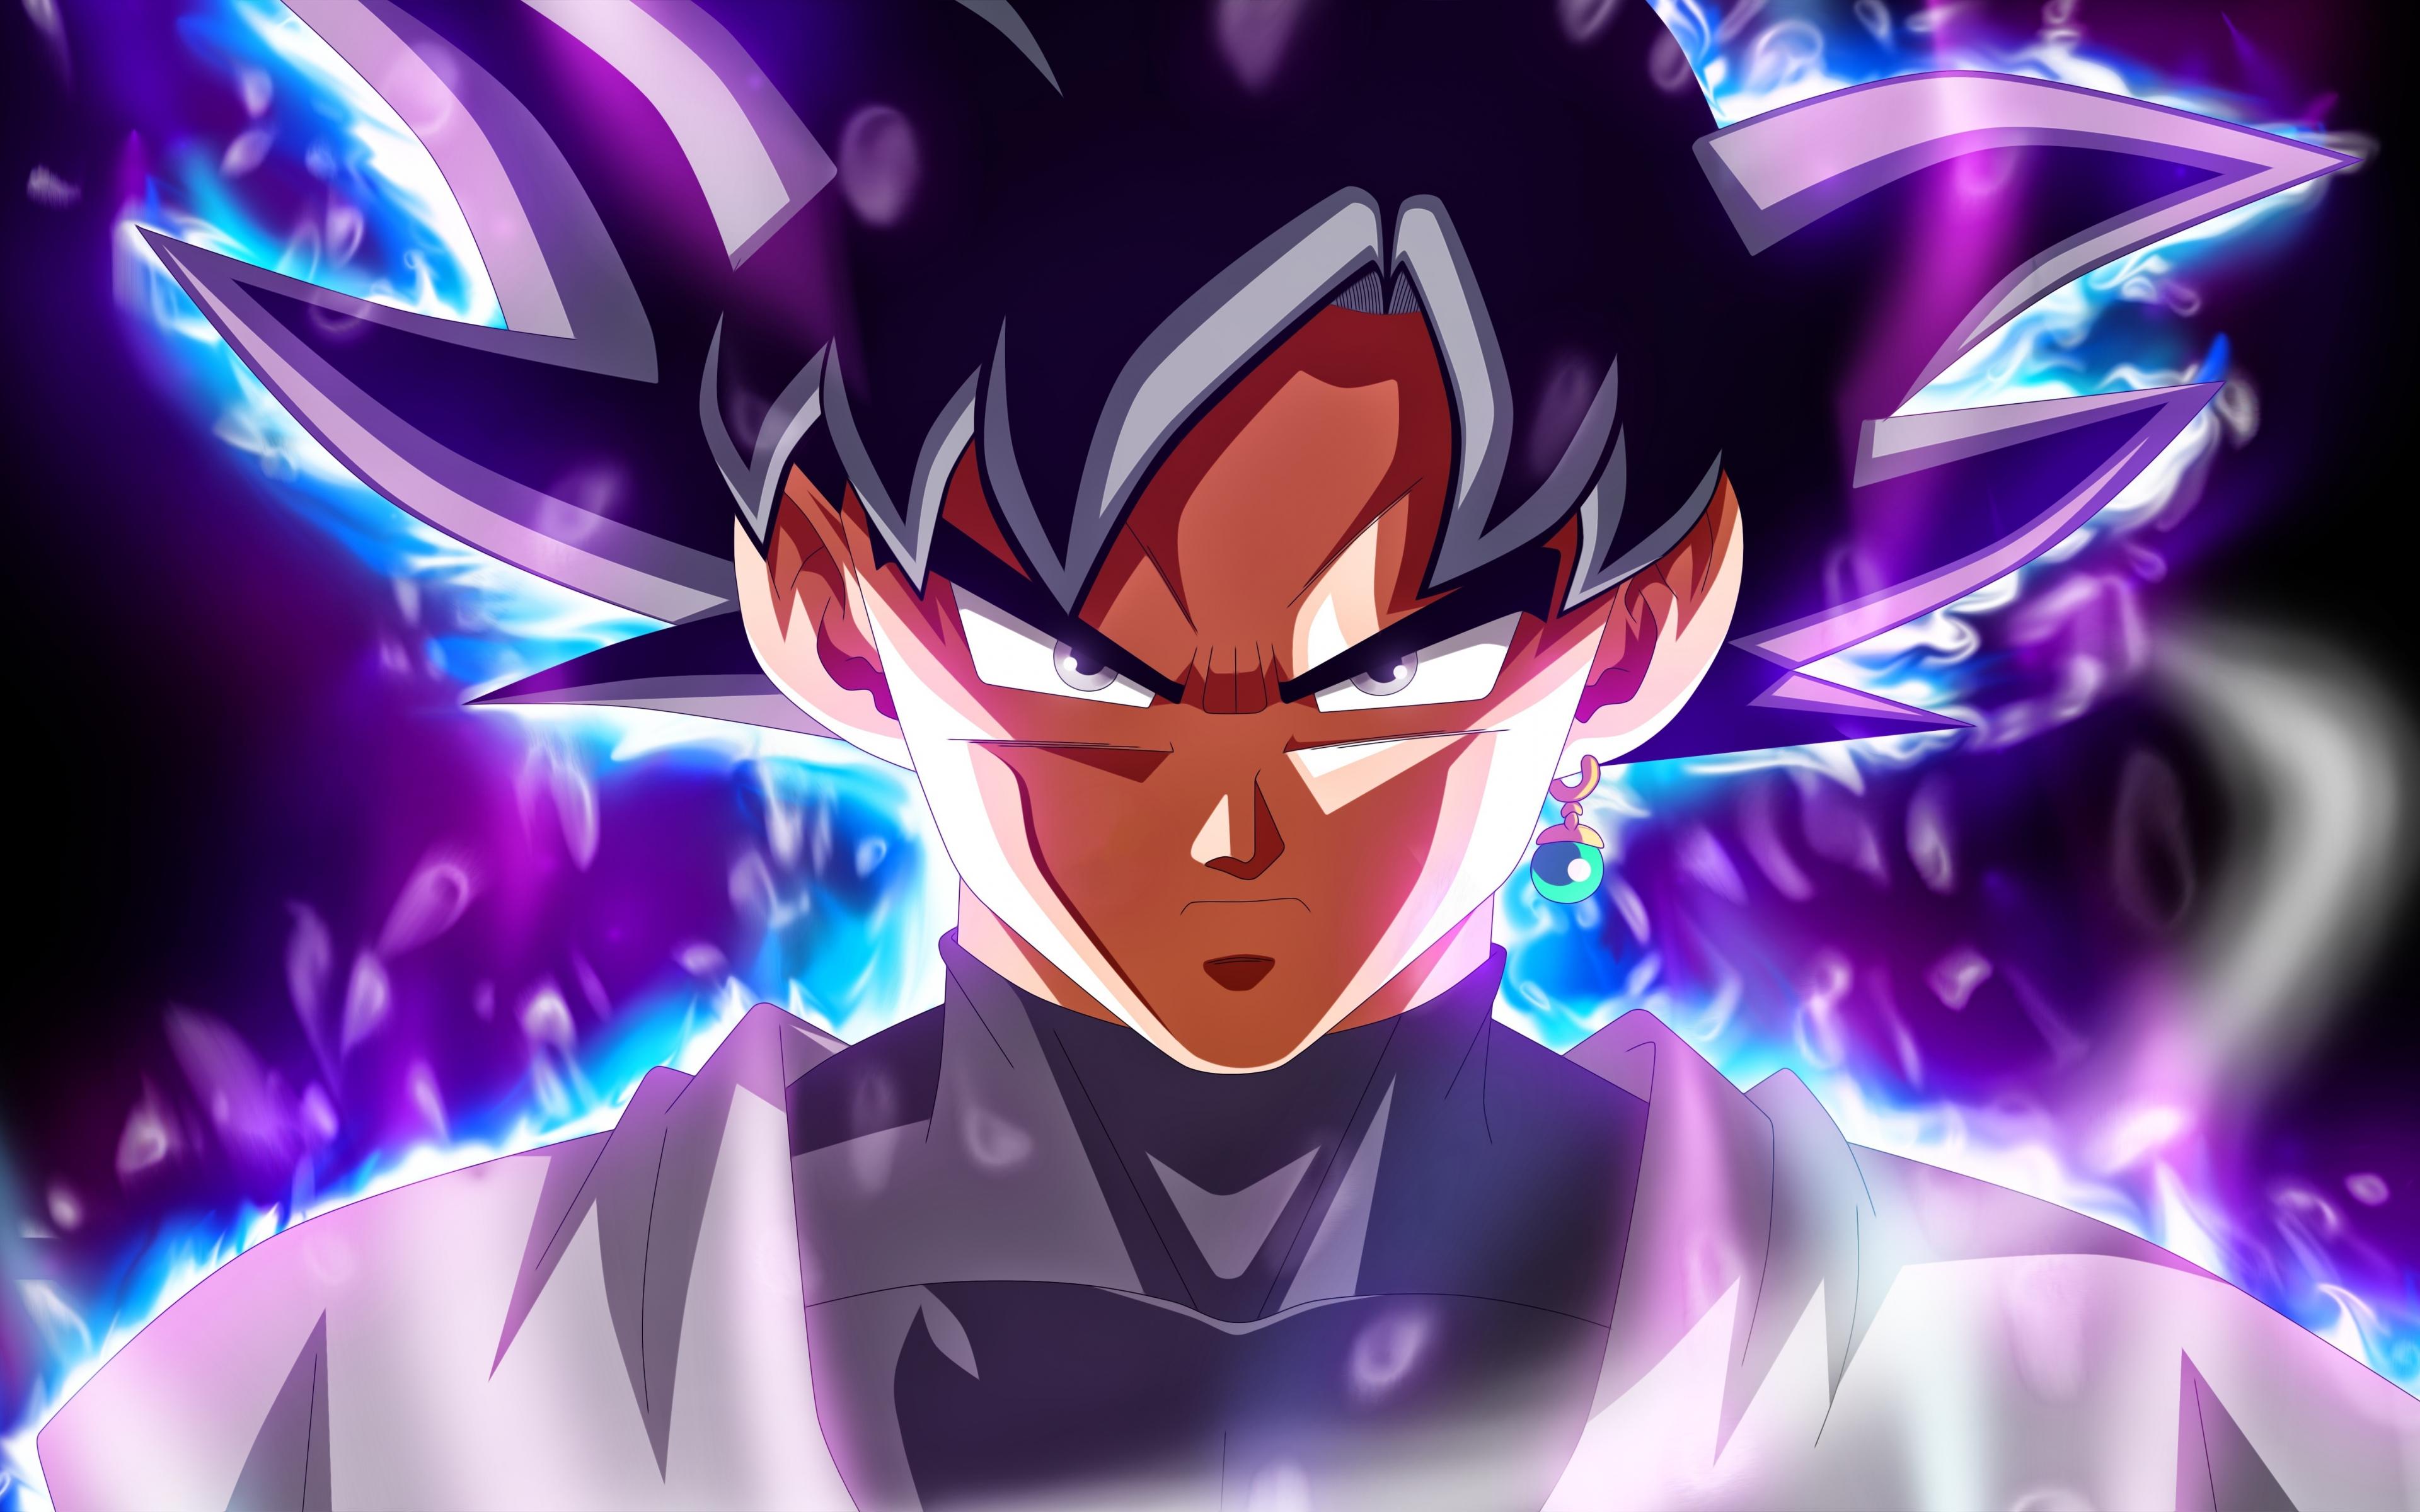 Ultra Instinct Goku Hd Wallpaper: Download 3840x2400 Wallpaper Ultra Instinct, Dragon Ball